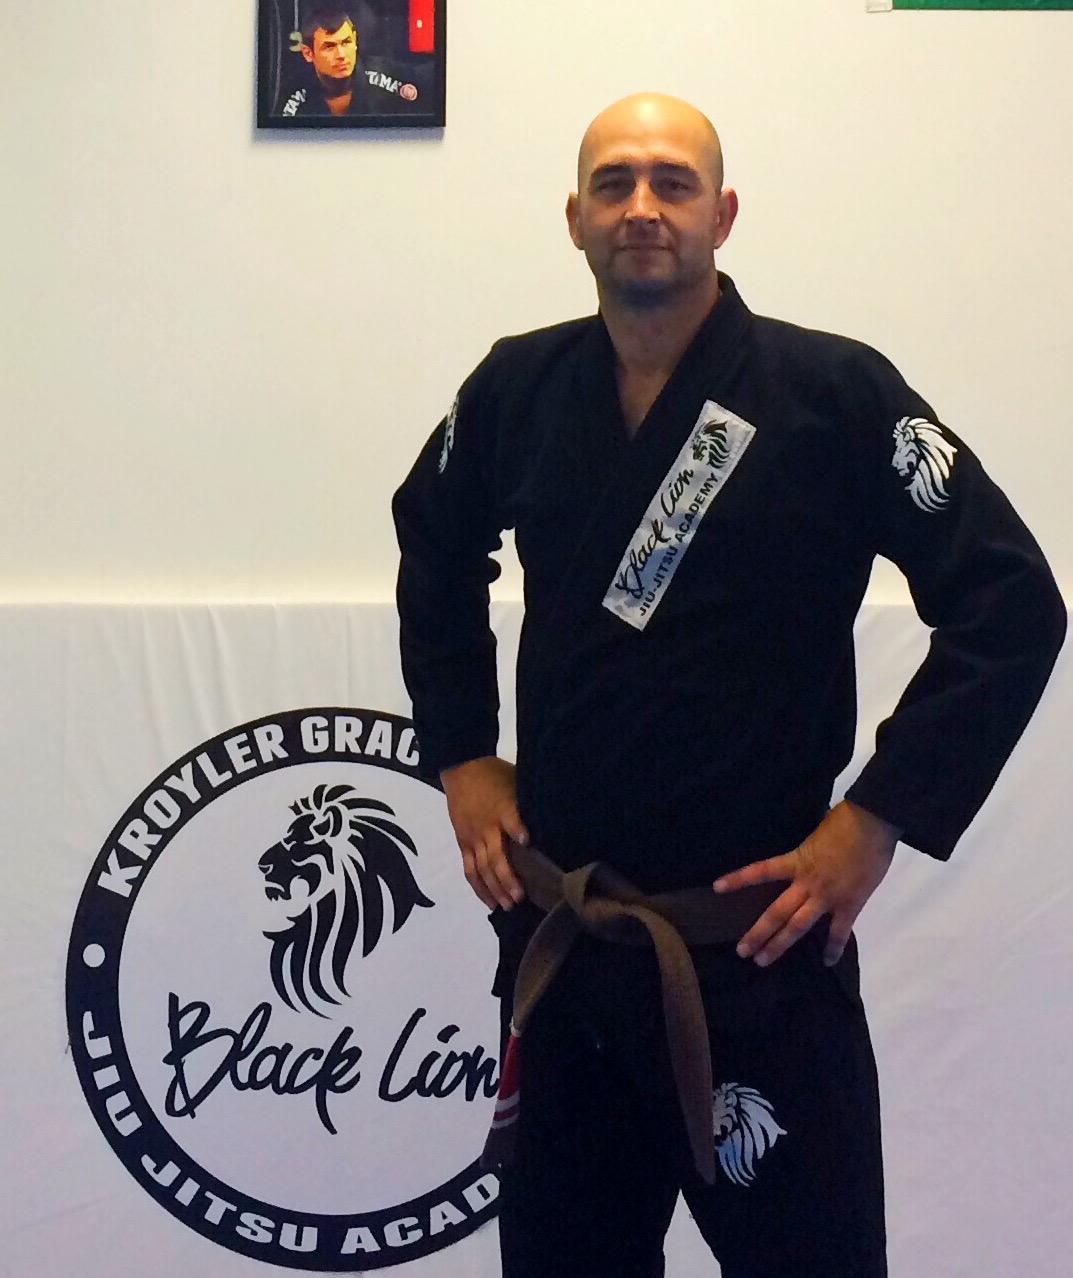 Chad Pomeroy - Head Instructor at Black Lion Jiu-Jitsu Academy,a Kroyler Gracie Jiu-Jitsu Affiliate